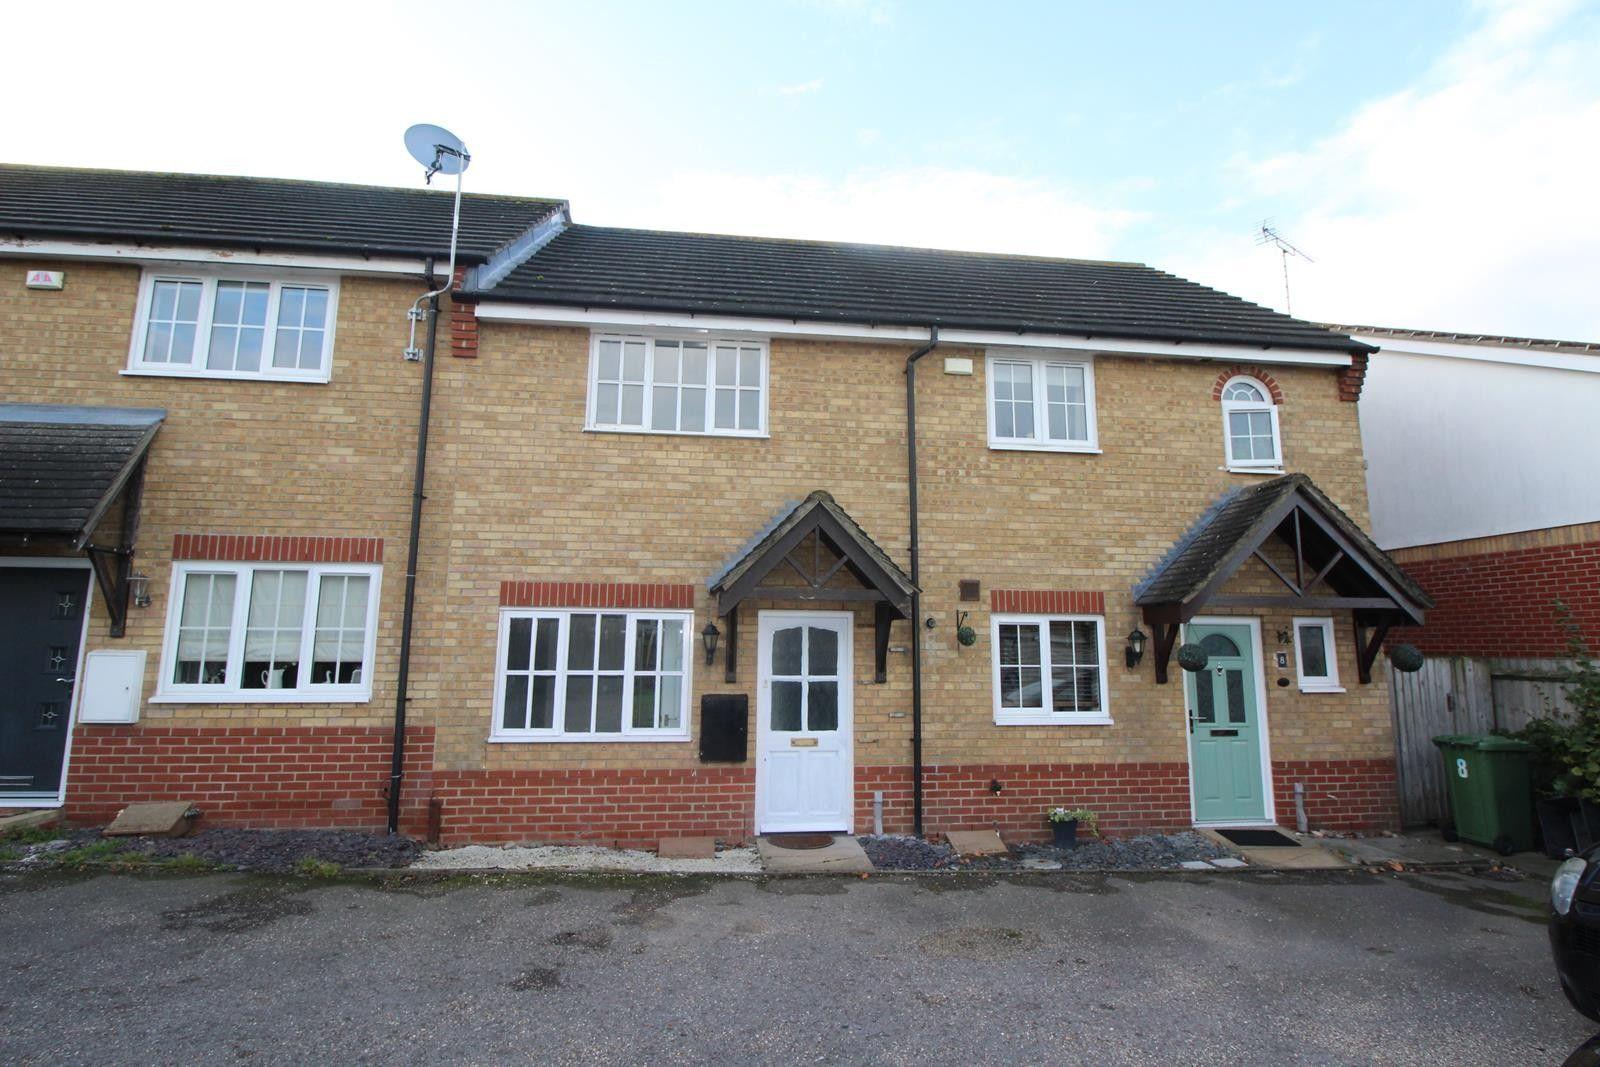 Property photo 1 of 6. Exterior Photo (Main